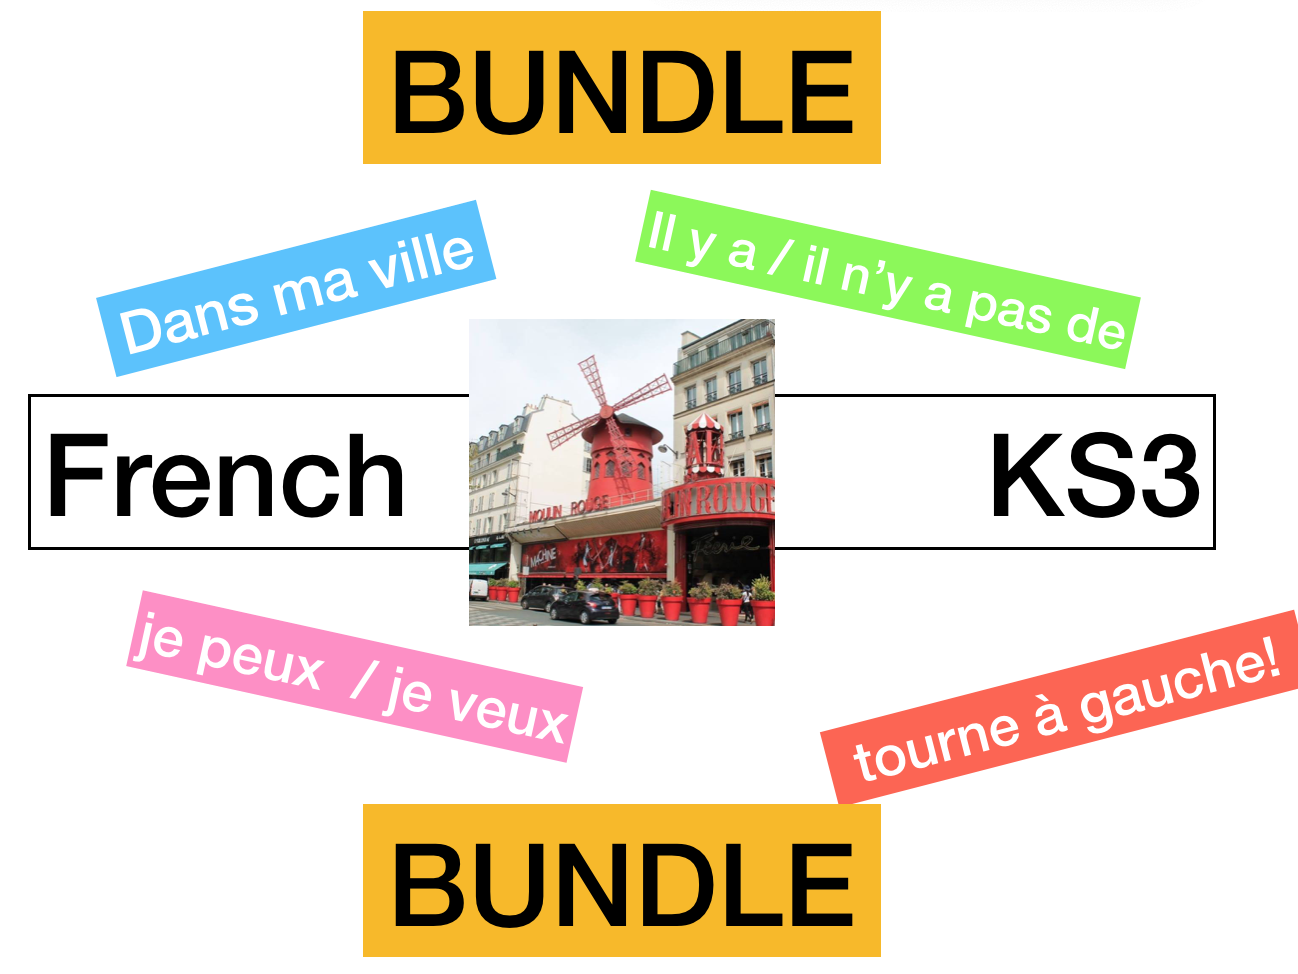 KS3 - French Allez 1 Mon quartier (5.1 -5.2 -5.3 - 5.4)